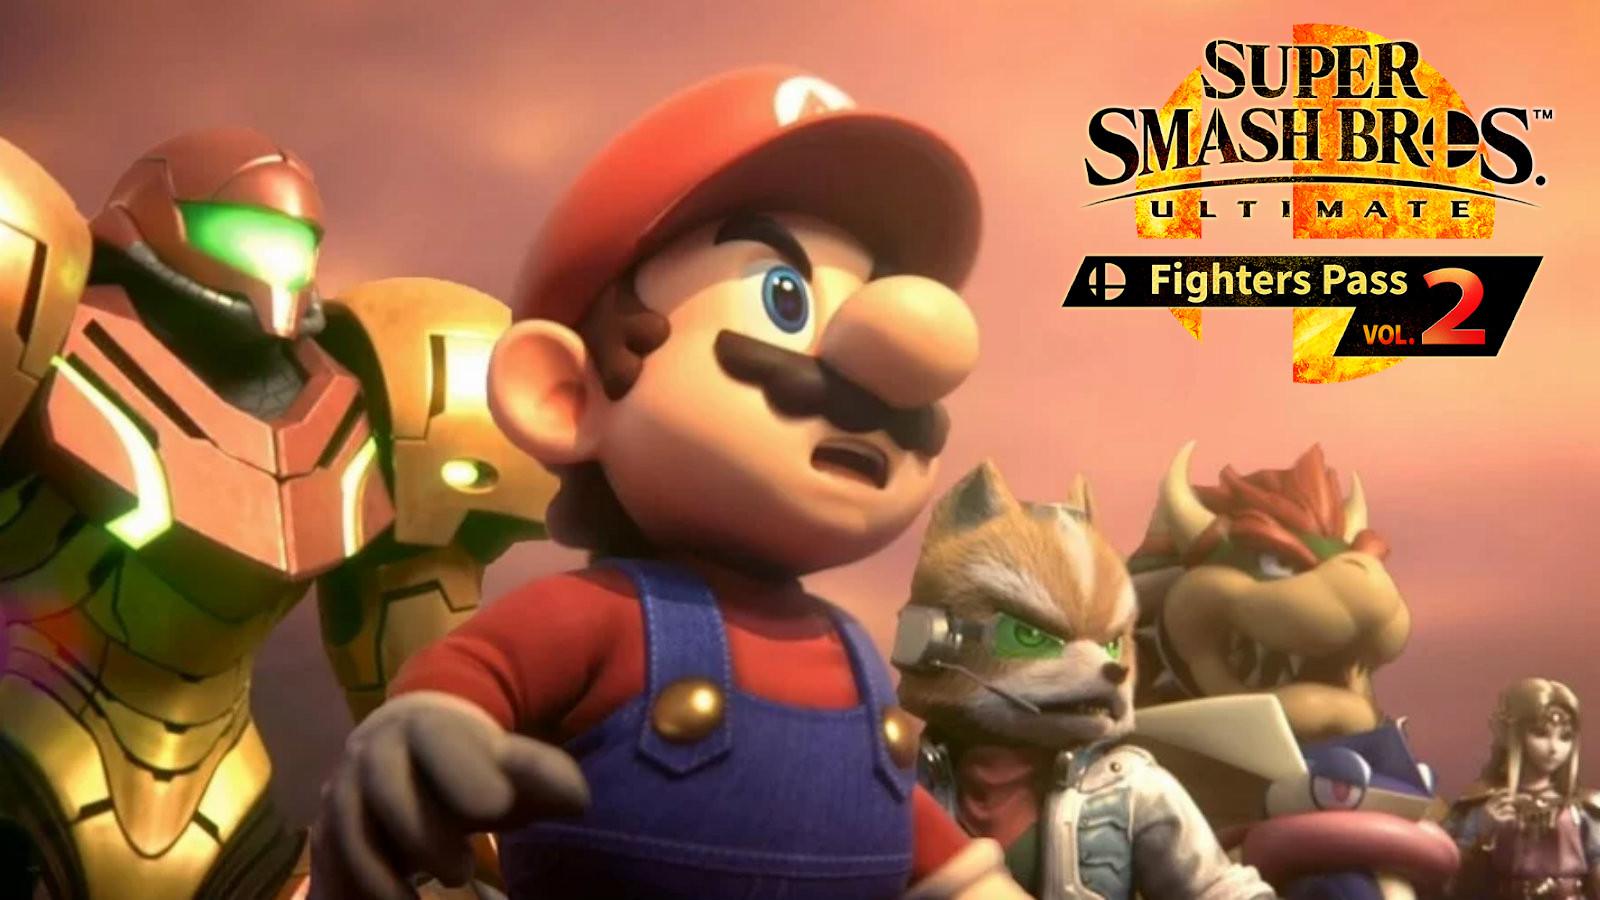 Mario, Samus and Fox stare ahead on a cliff